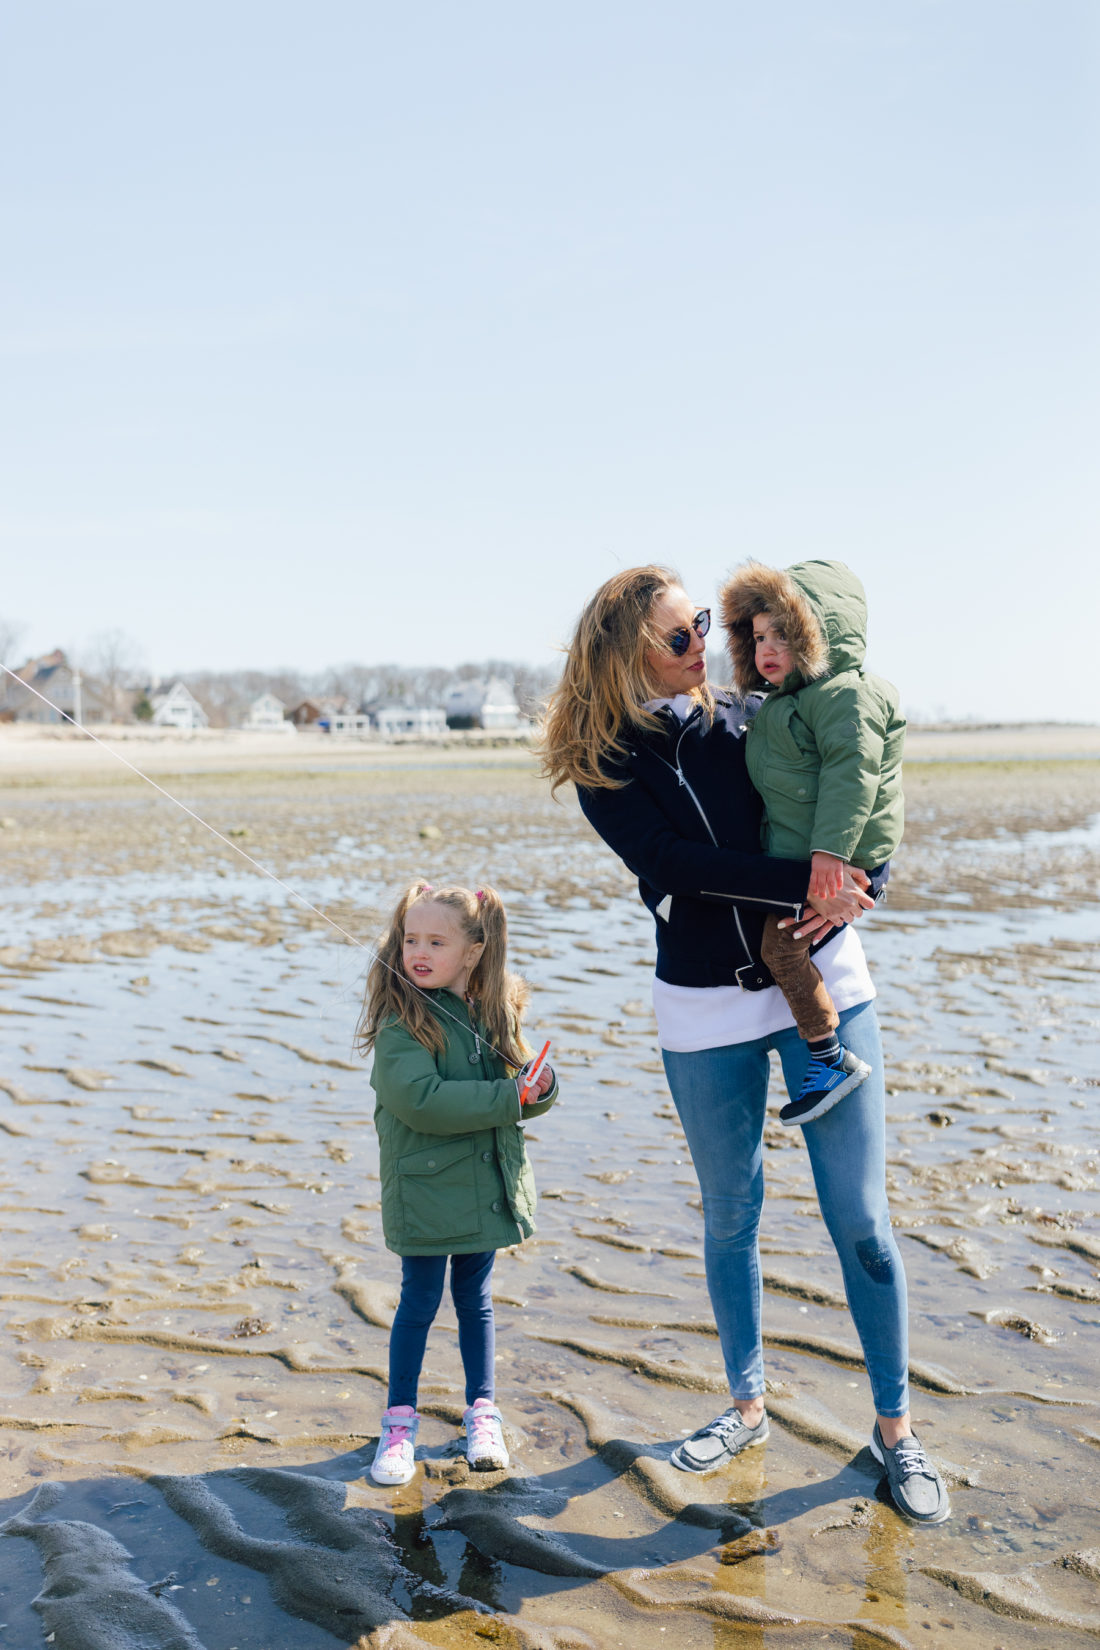 Eva Amurri Martino of Happily Eva After wears Skechers GoWalk Lite Isla Boat Shoe with her kids Marlowe and Major on the beach